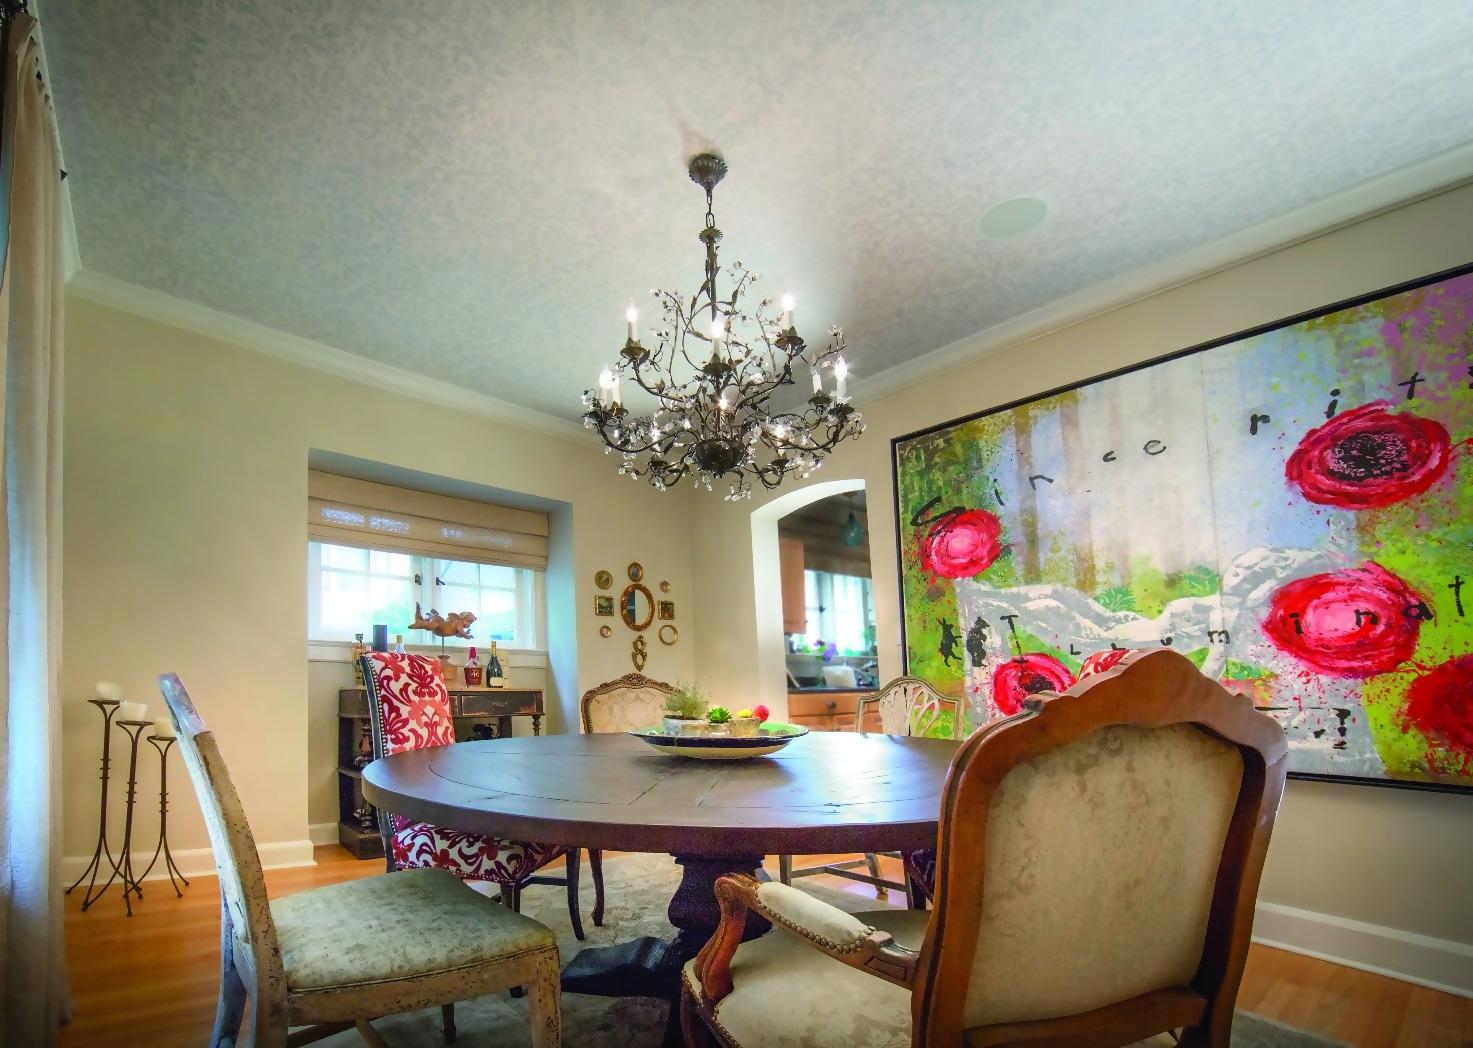 Awesome Dining Room Décor Ideas - Interior Design Explained